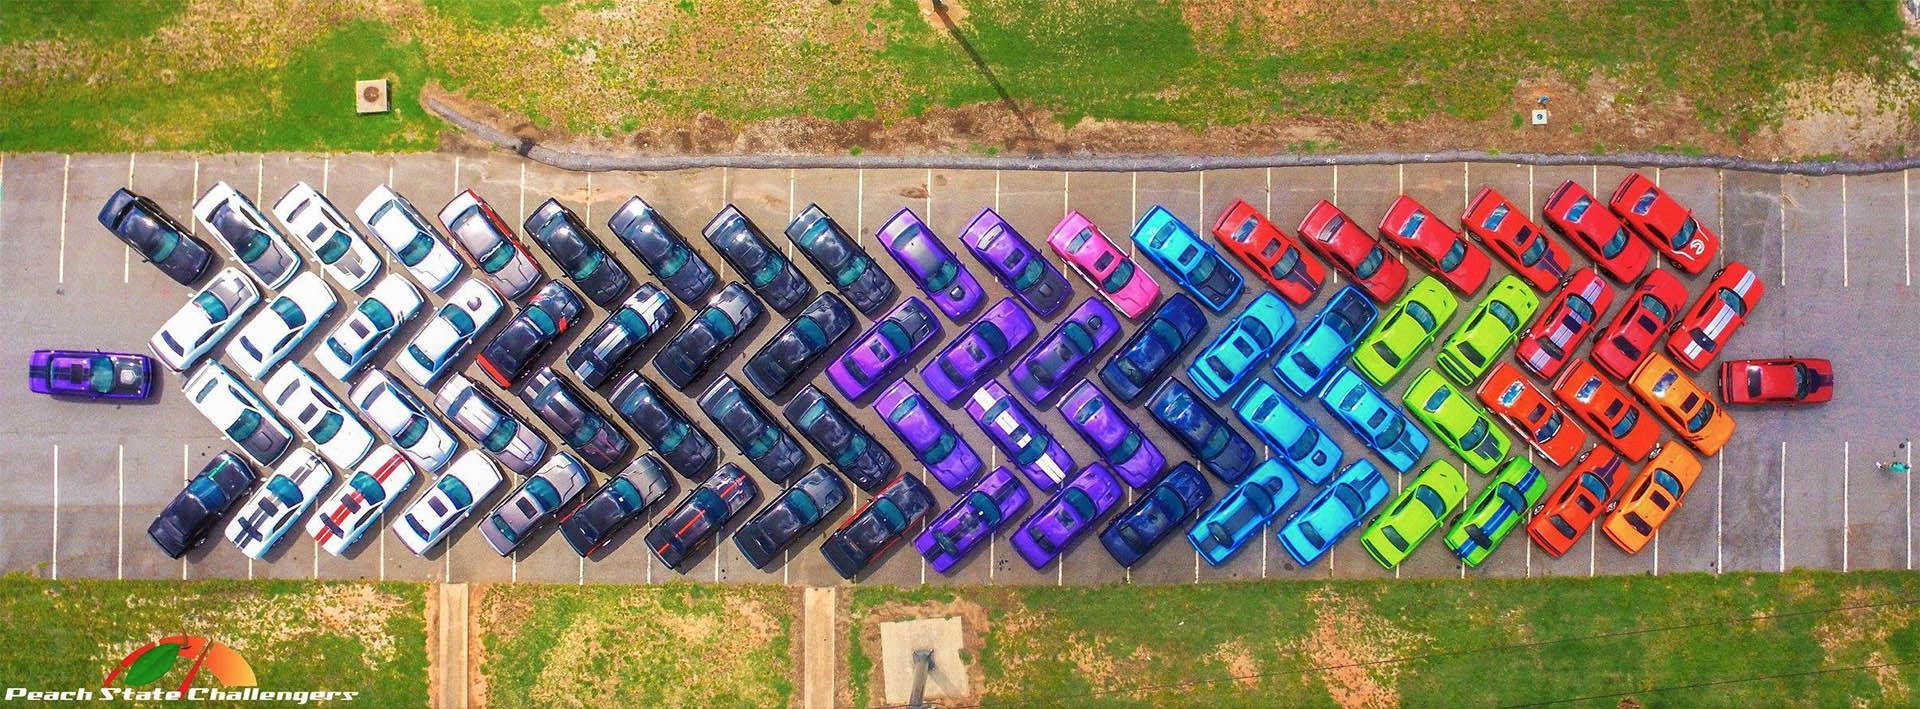 A Rainbow Of Dodge Challengers 95 Octane